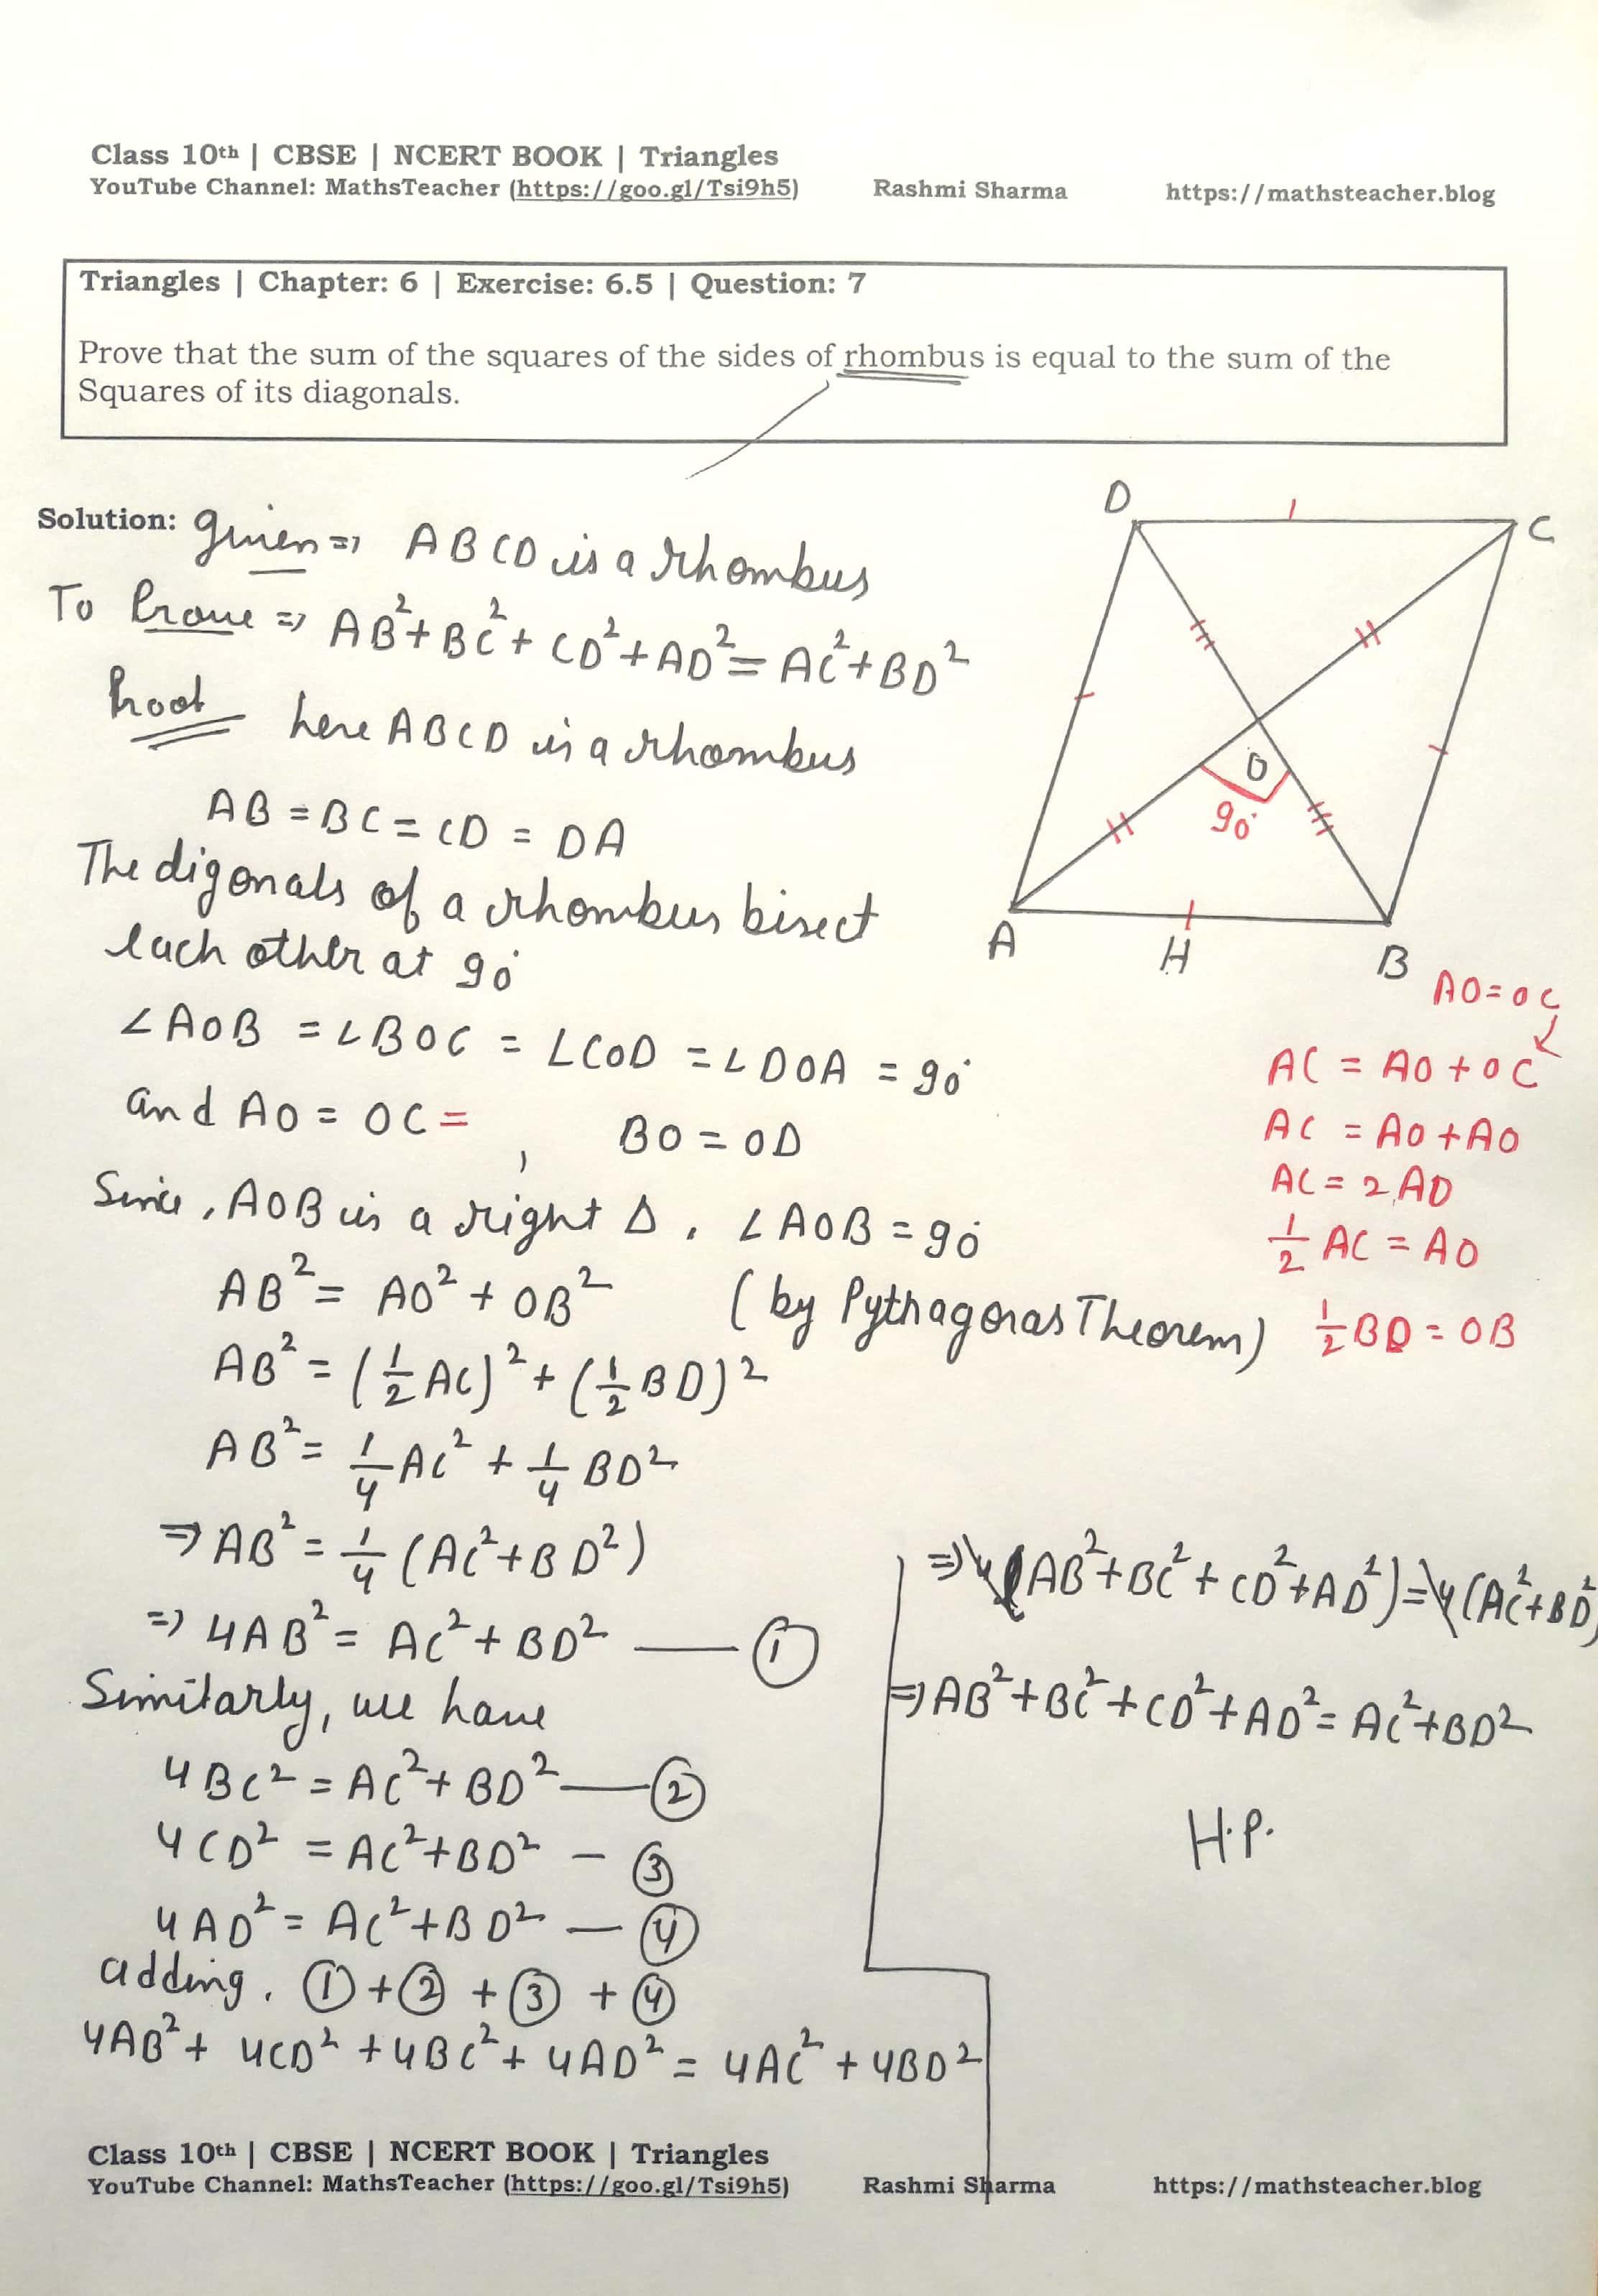 ncert solutions class 12 maths chapter 6 exercise 6.5